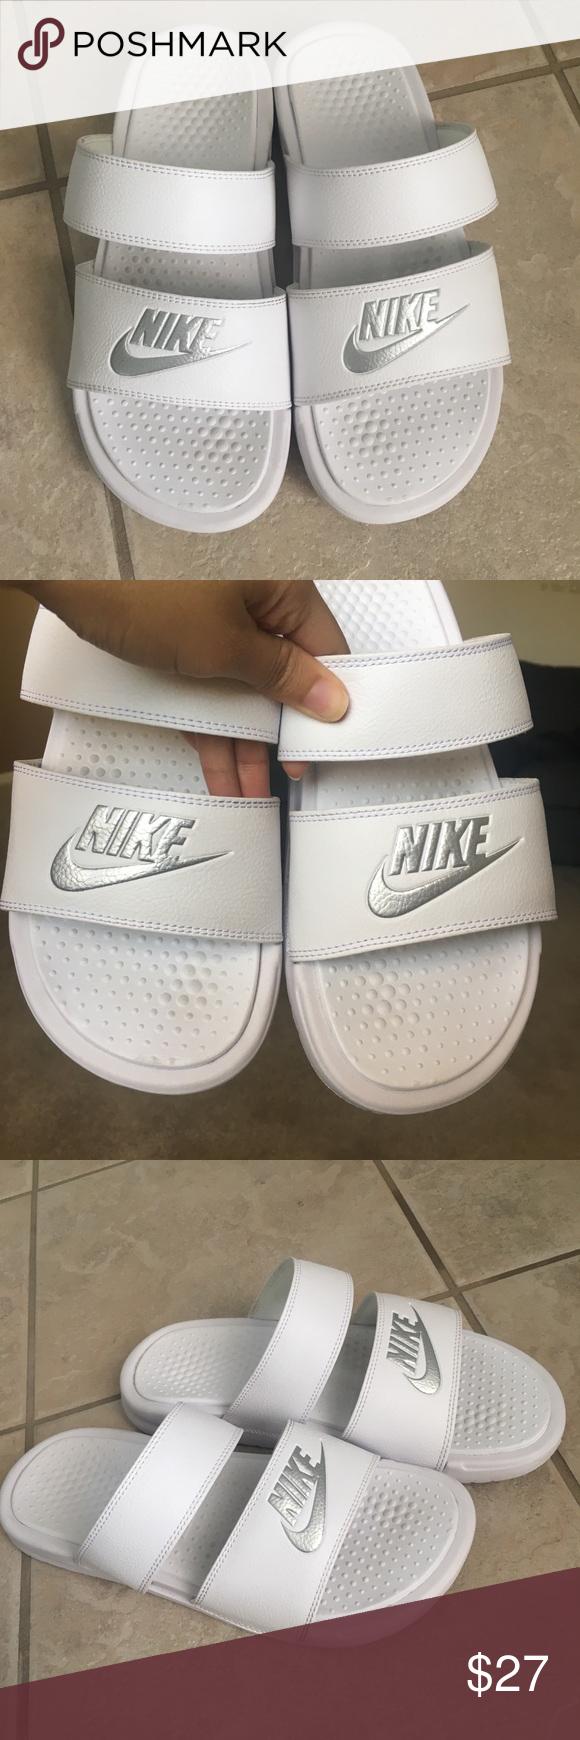 7a506c4dc33e4 Nike